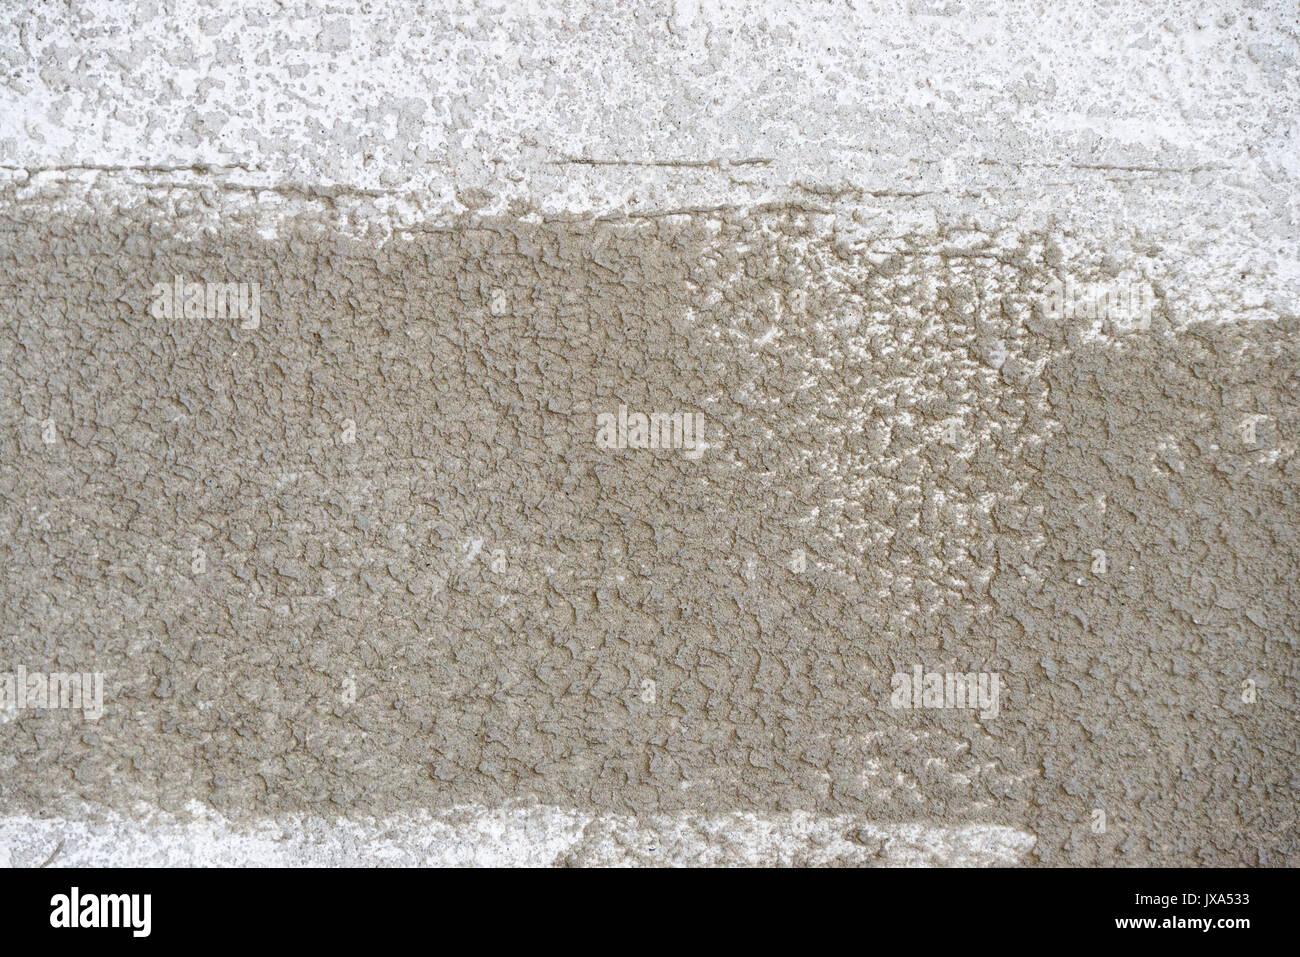 Fresh wet concrete texture. Cement wall,concrete floor for texture background. - Stock Image